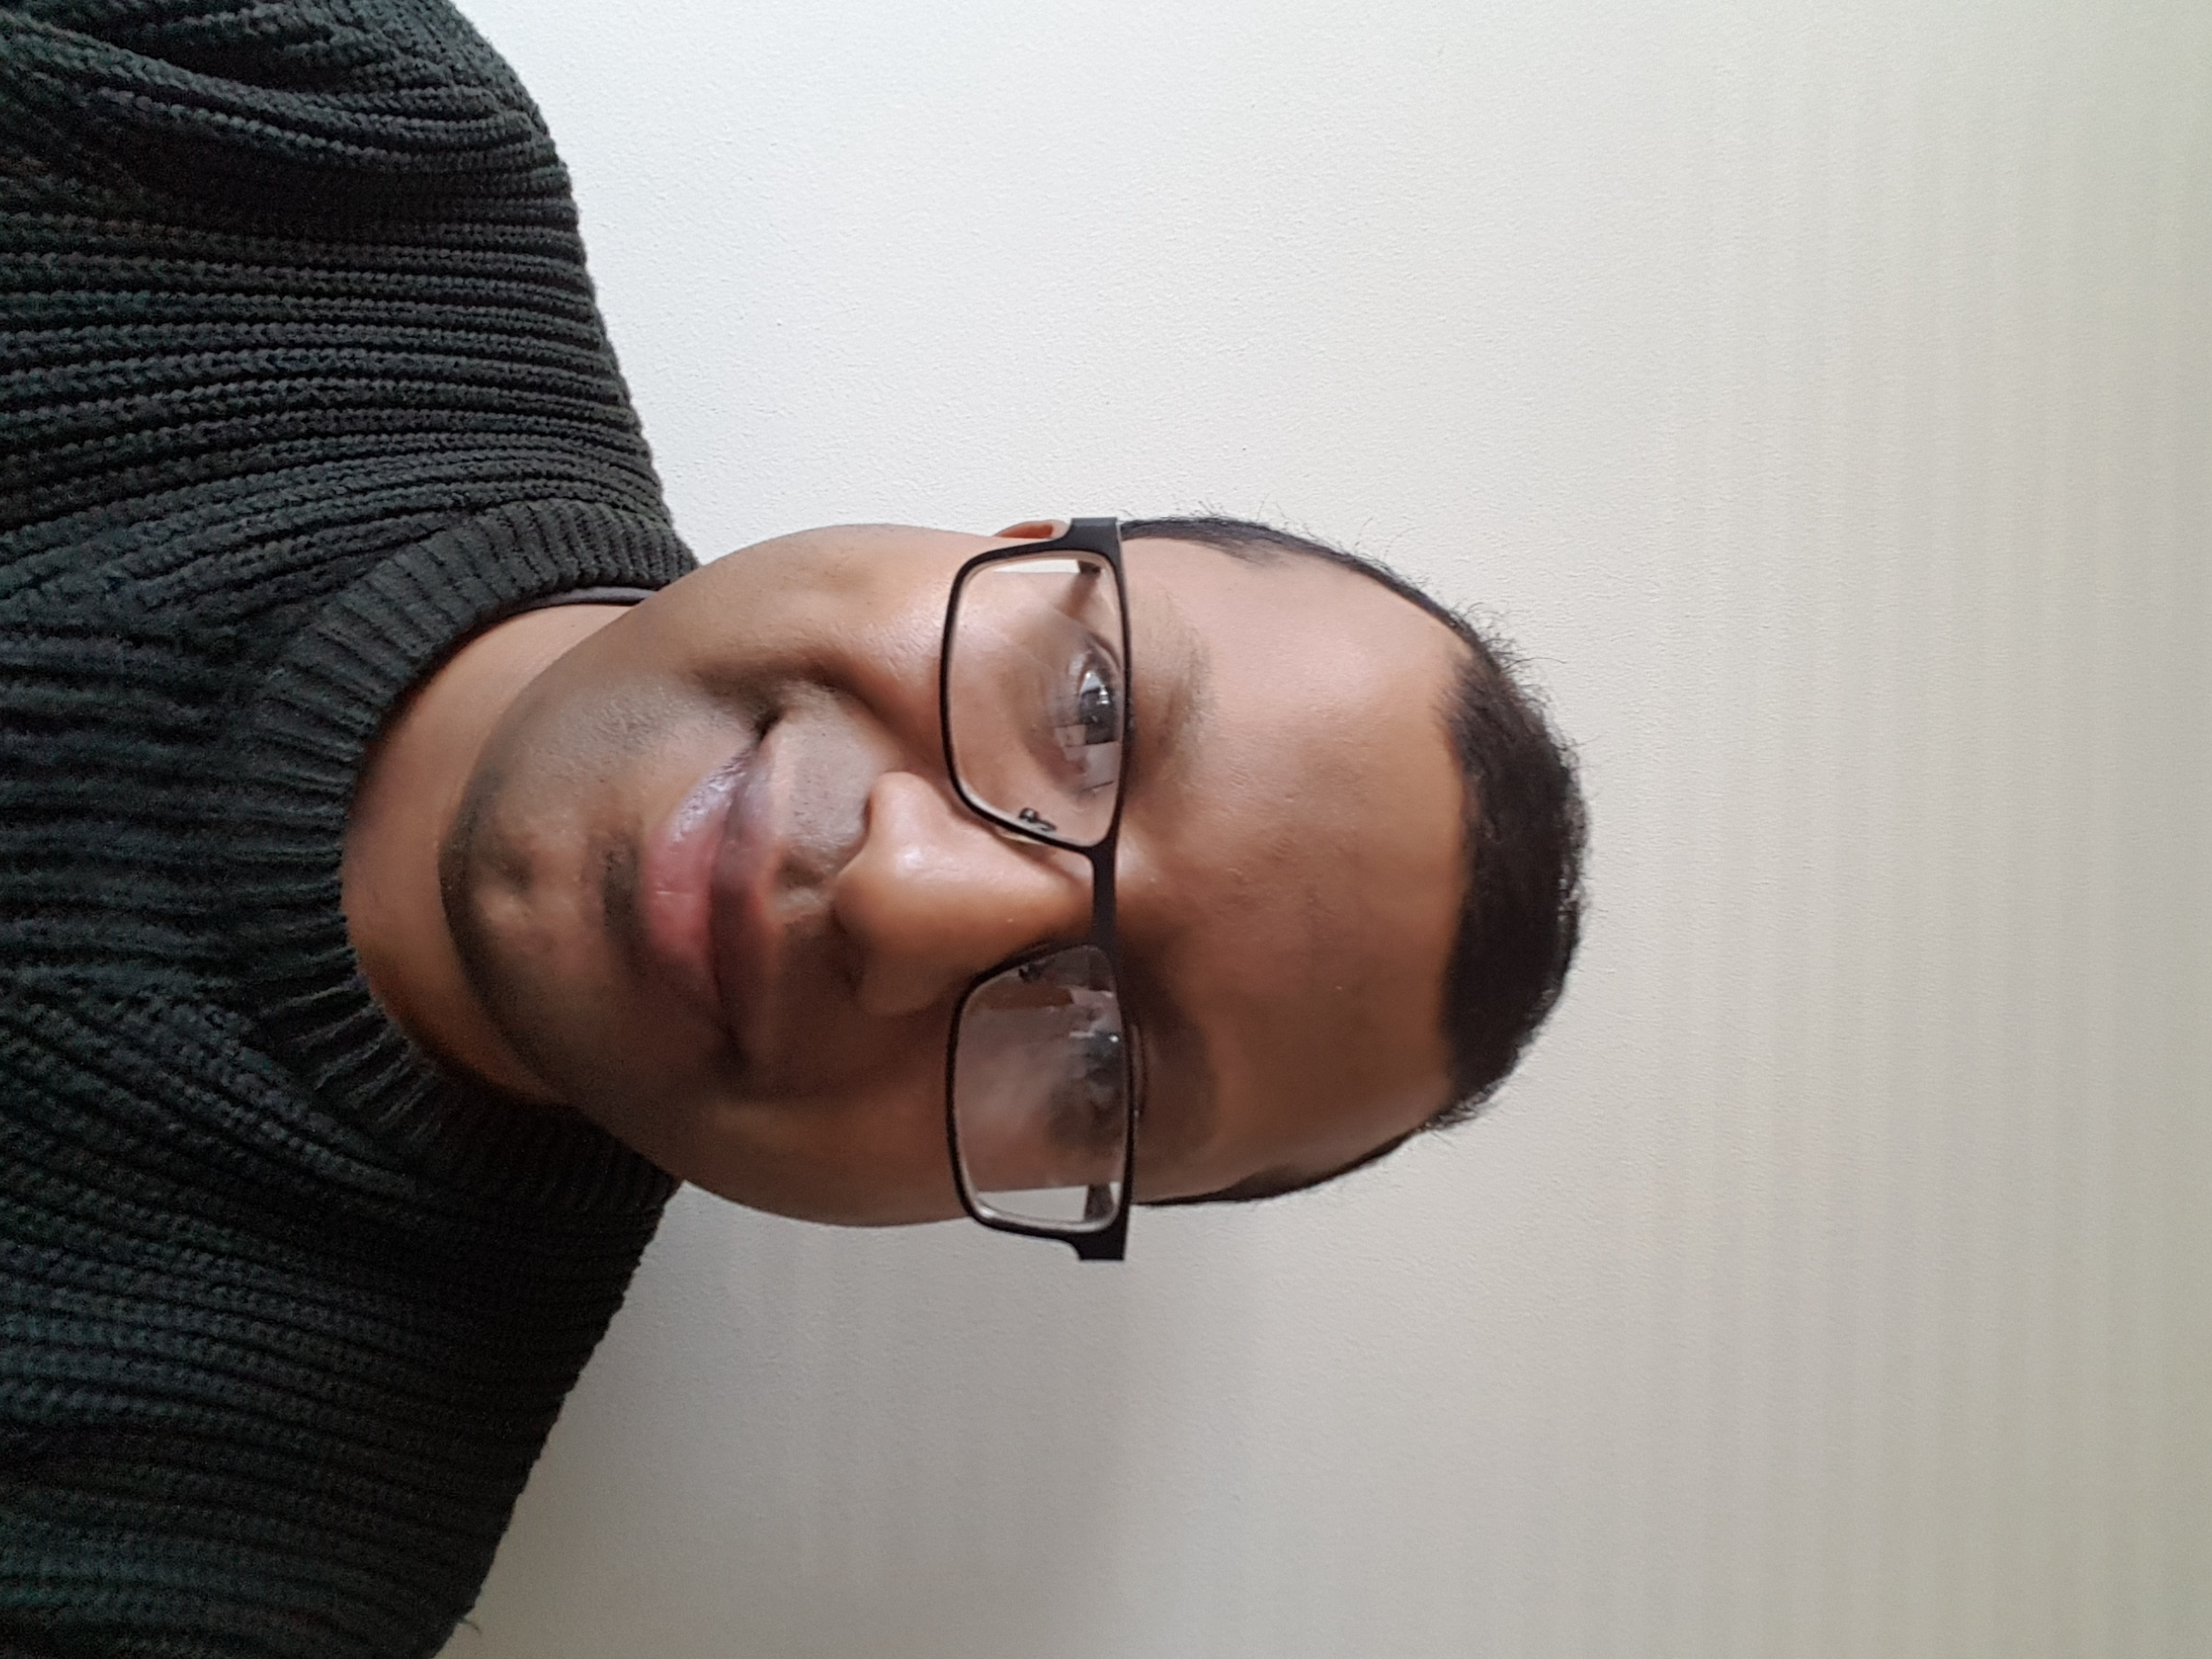 Mr. Mahinthan Tutor